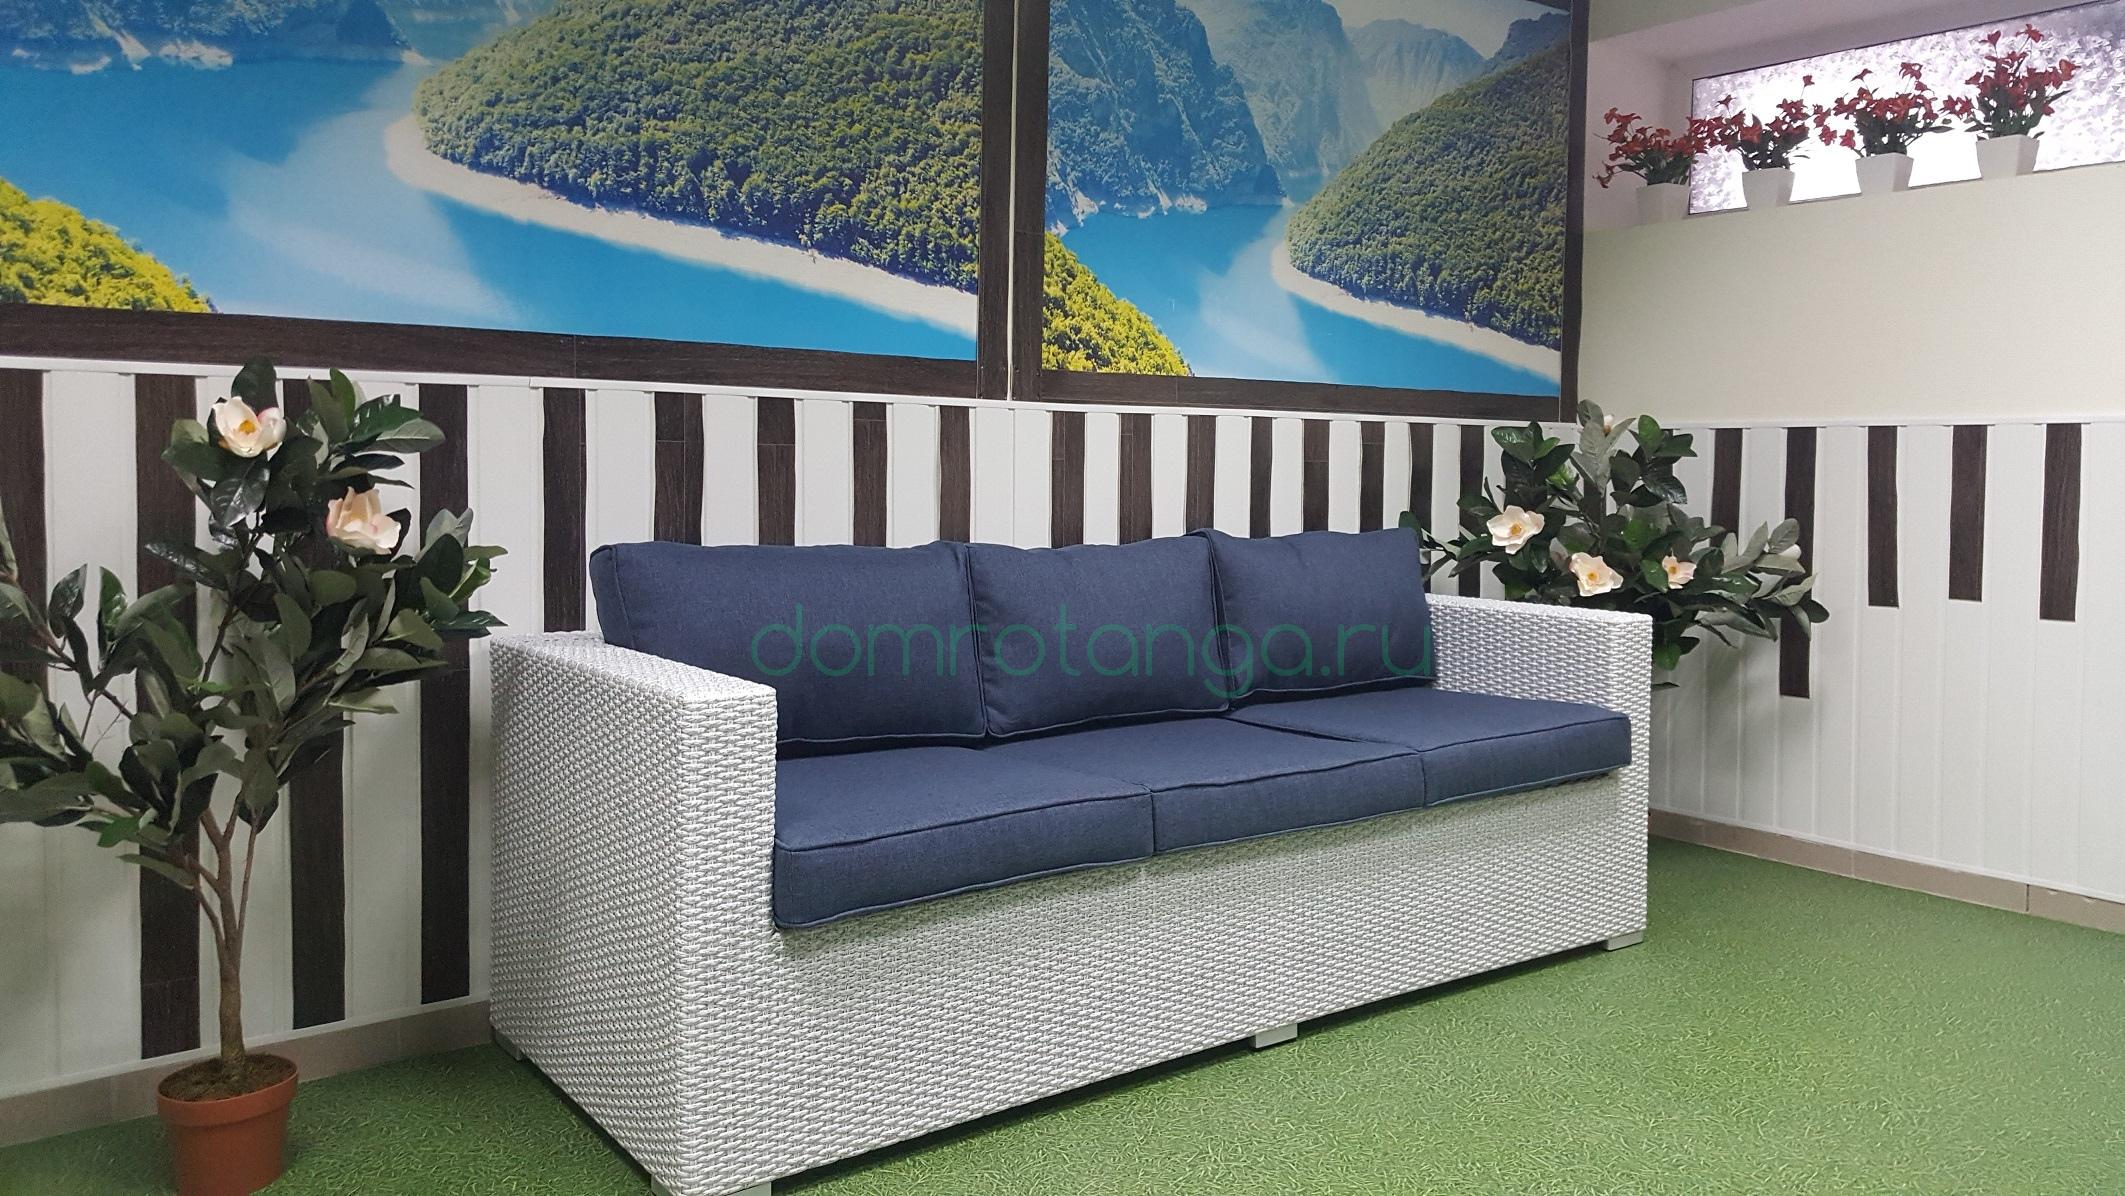 Плетеный диван «Louisiana» white & blue, 3-местный